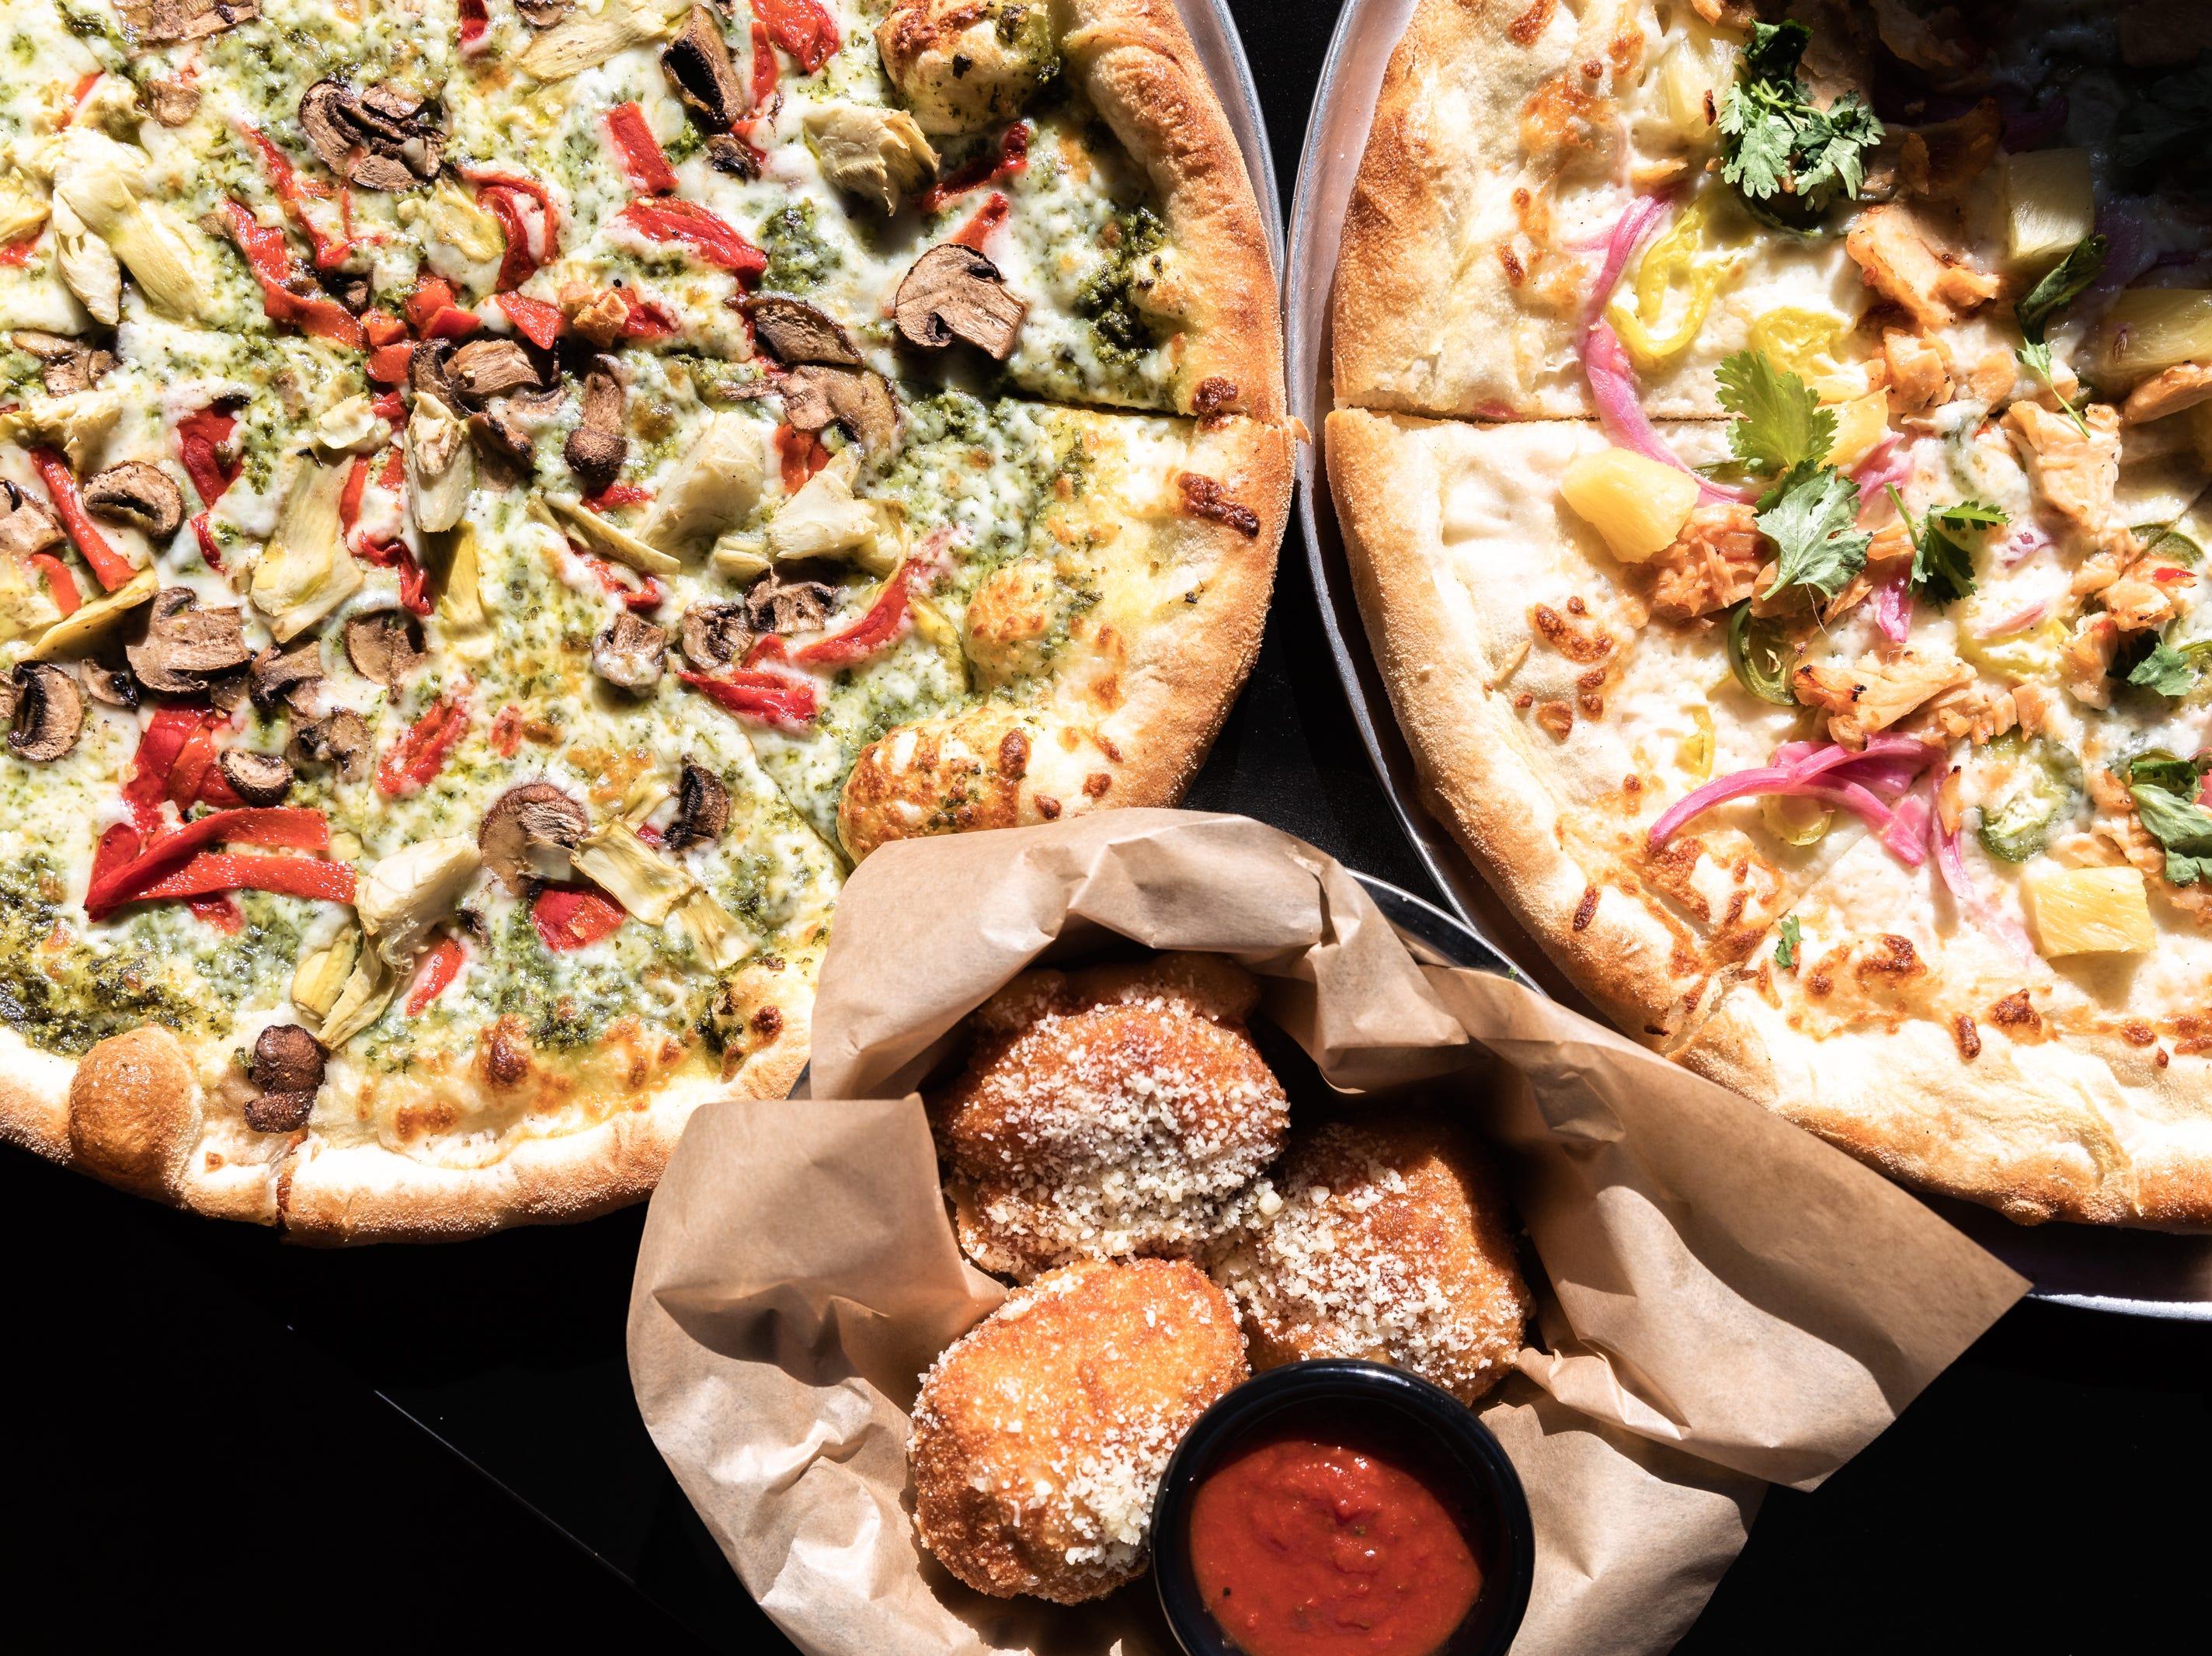 Galactic Pizza's Pesto Artichoke pizza, Bahn Mi pizza and Meat Lovers spaceballs.